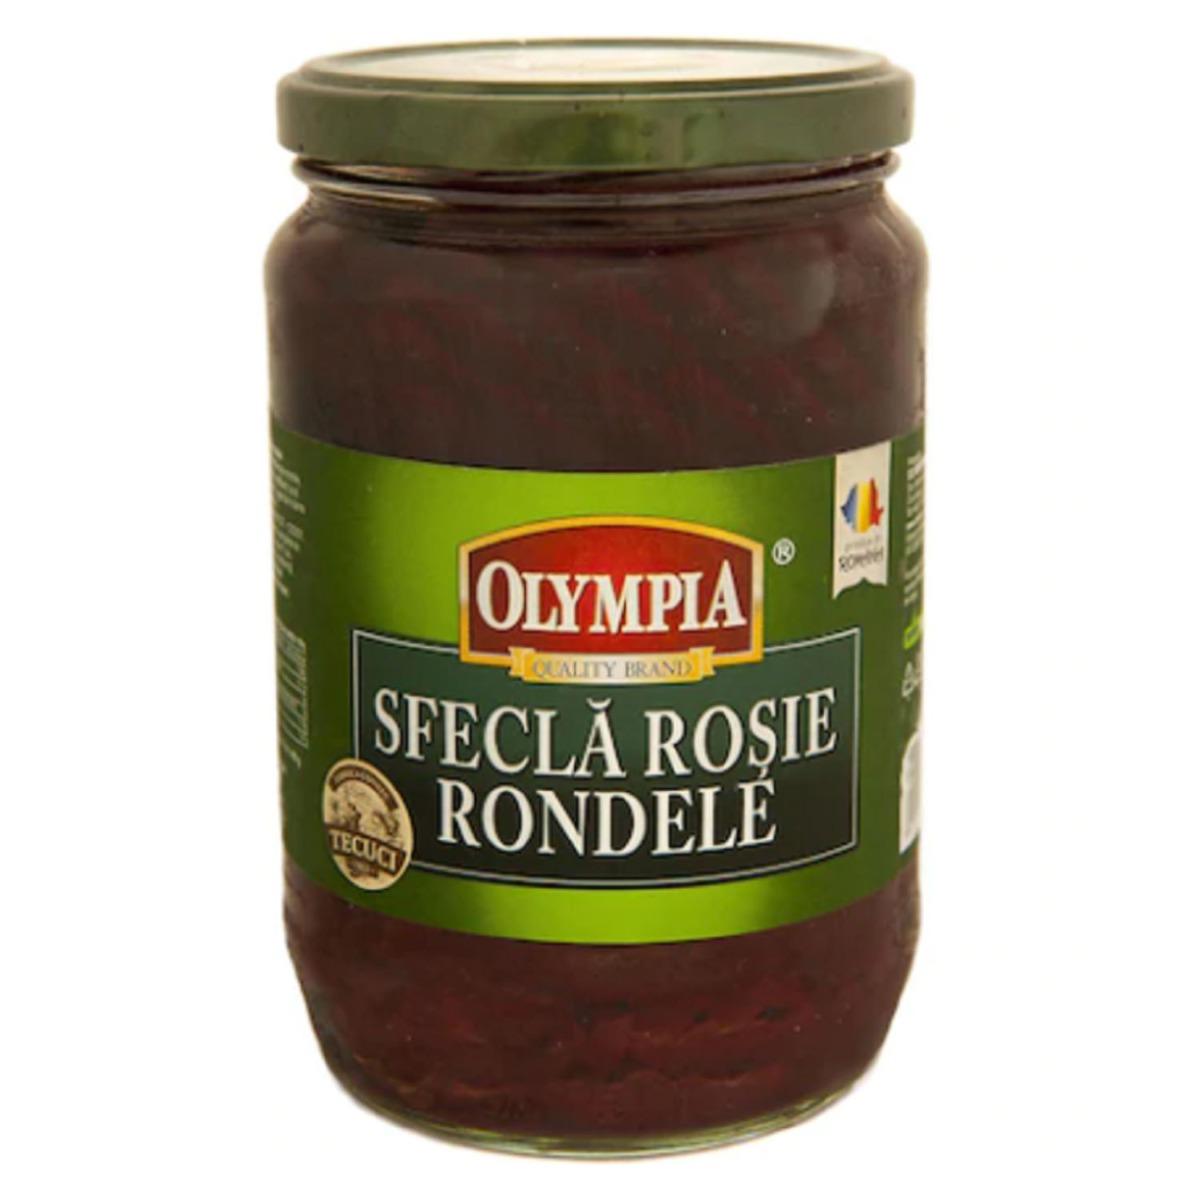 Salata de sfecla rosie rondele Olympia, 680 gr imagine